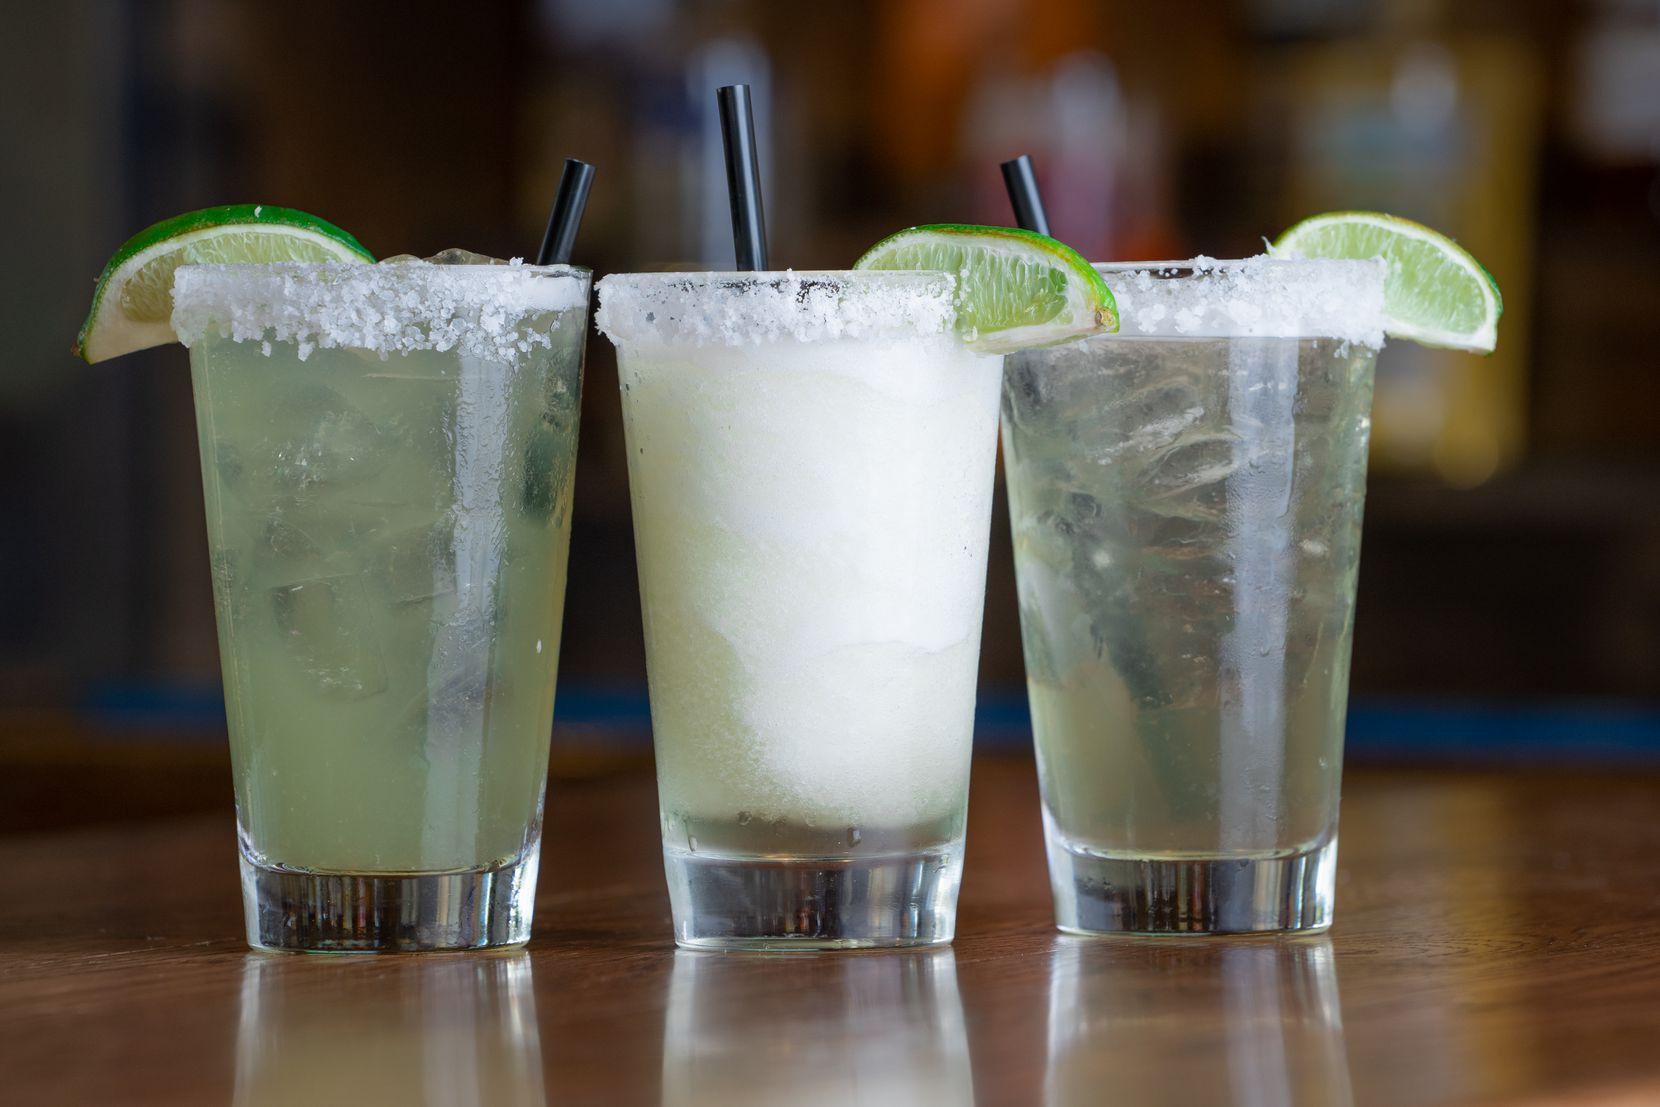 Snuffer's will serve $3.50 margaritas in celebration of National Margarita Day on Feb. 22, 2021.